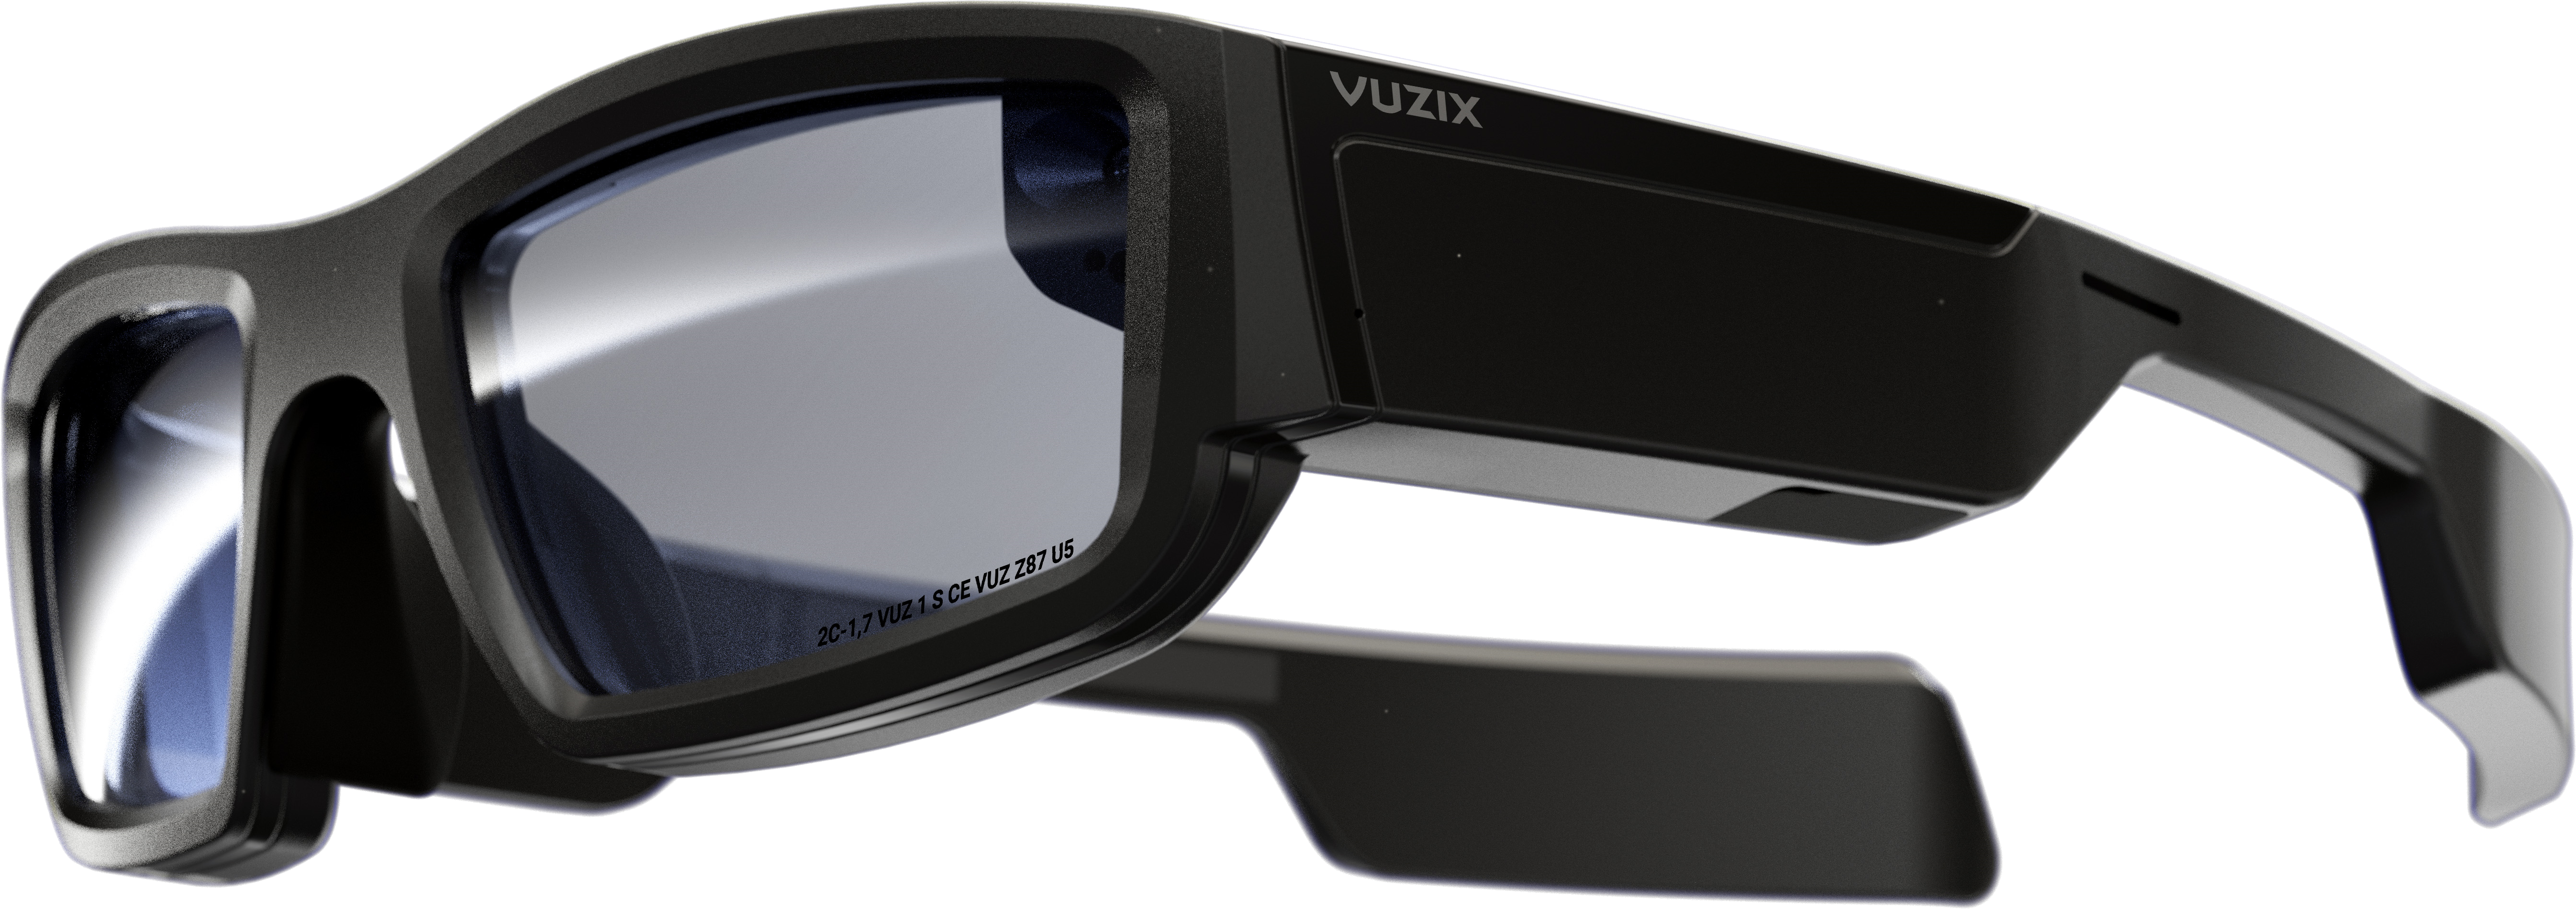 Vuzix Blade Smart Glasses - Safety Certified